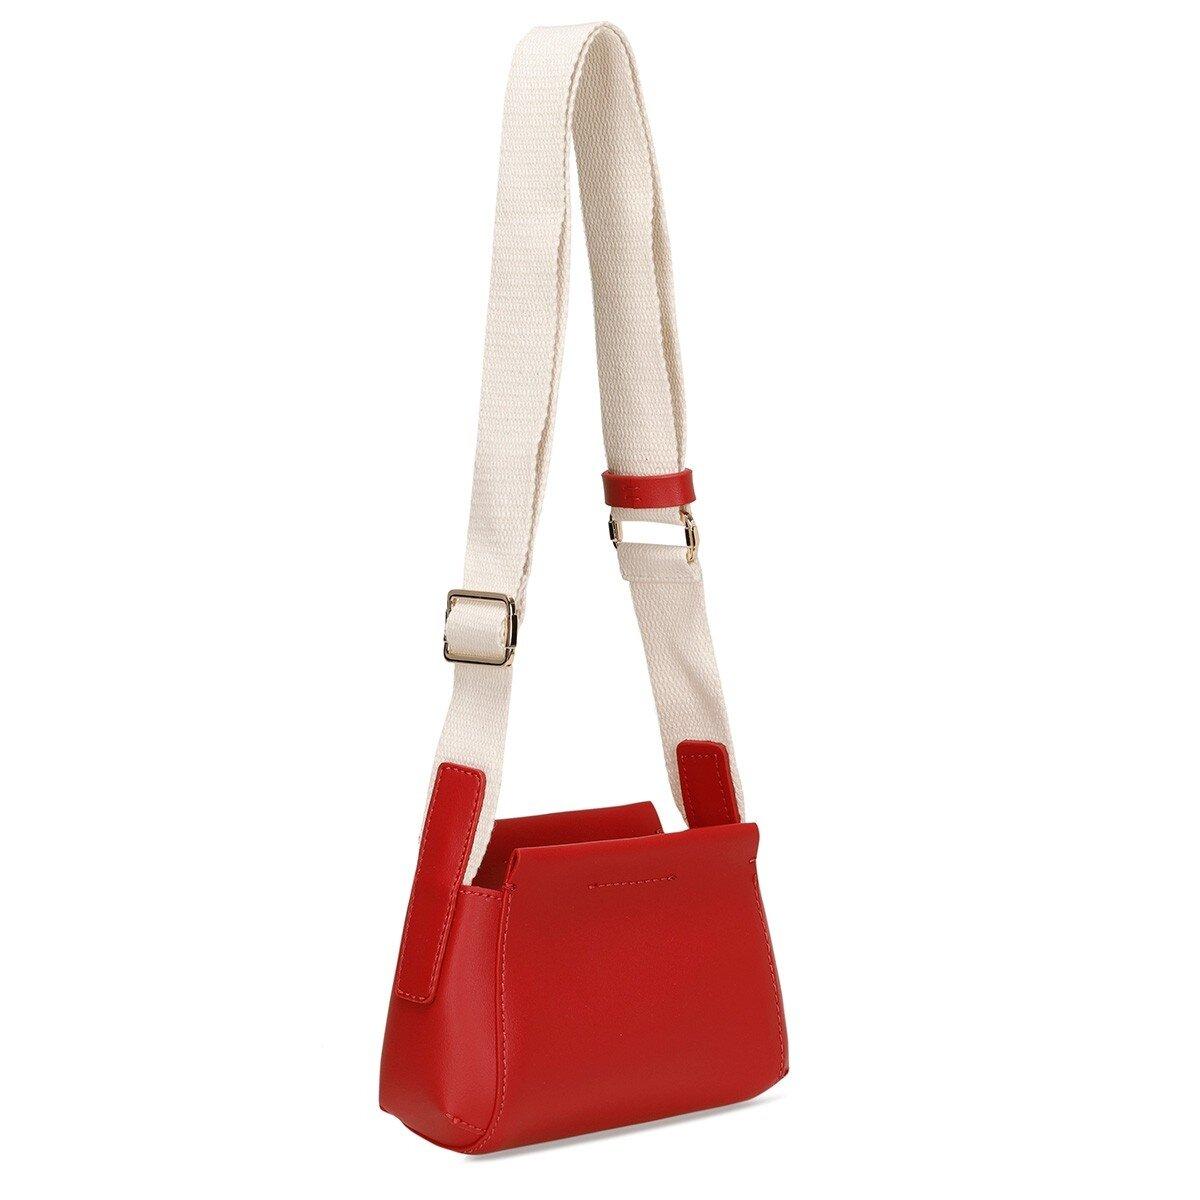 LUSIA 1FX Kırmızı Kadın Çapraz Çanta